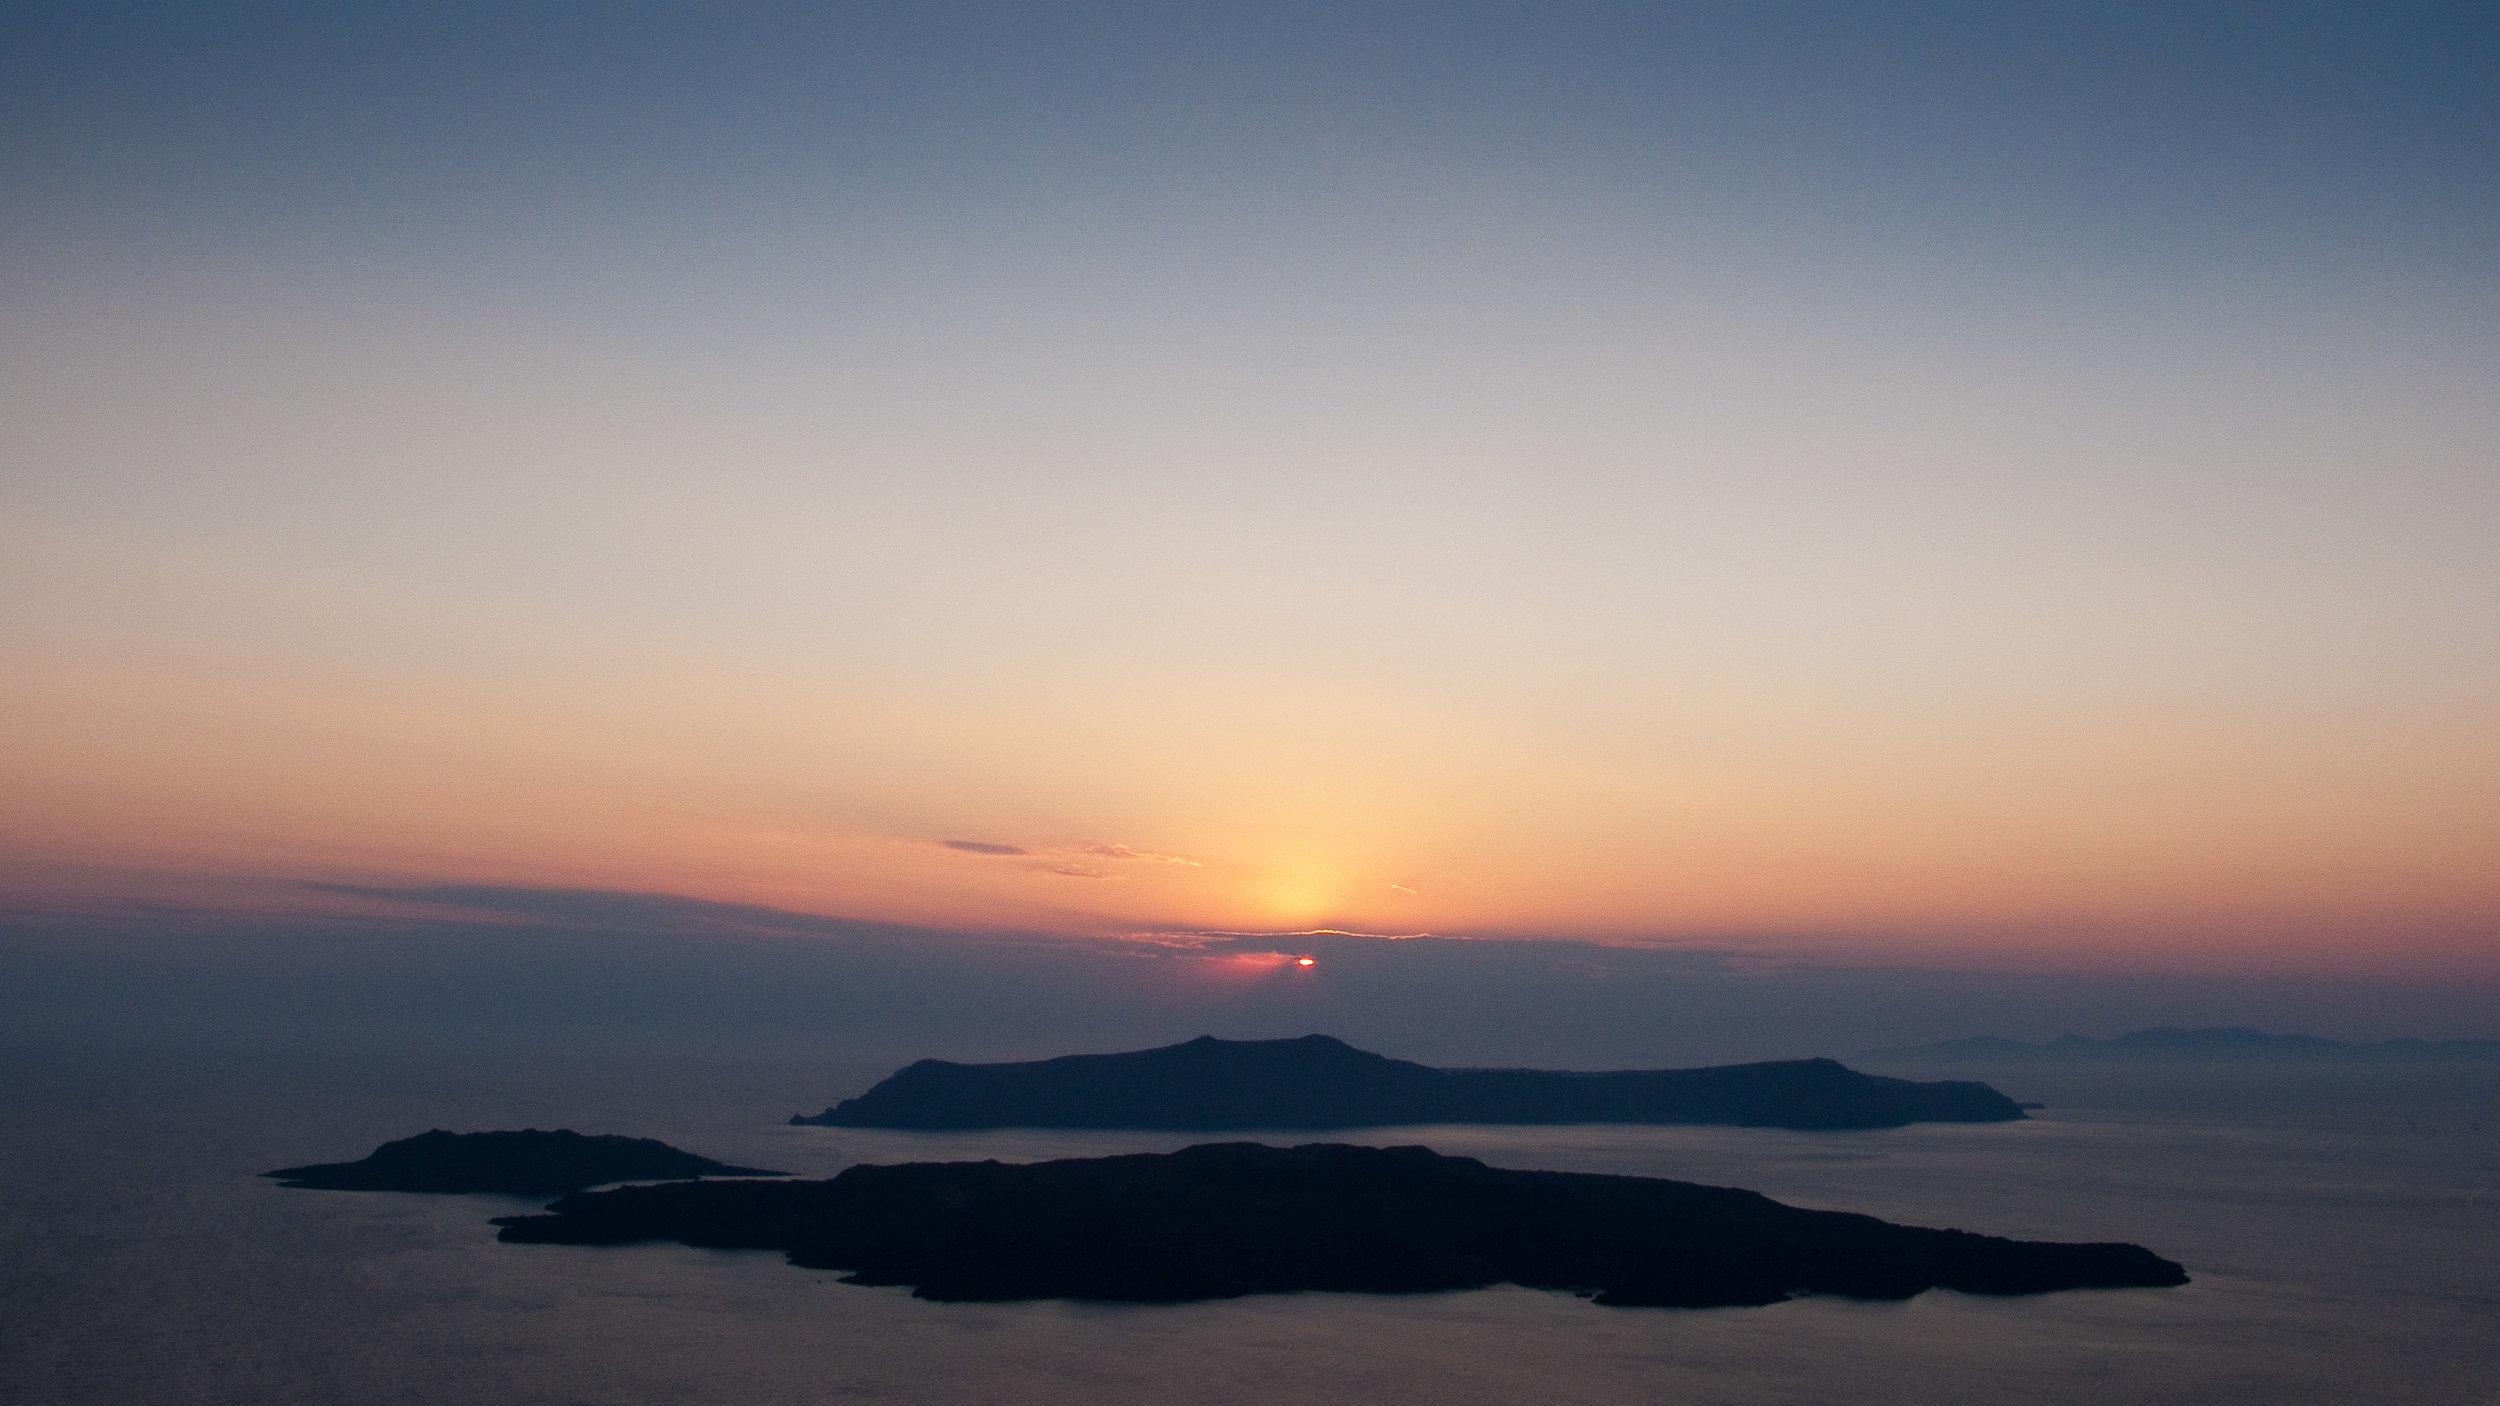 Santorini, Greece (12 images)